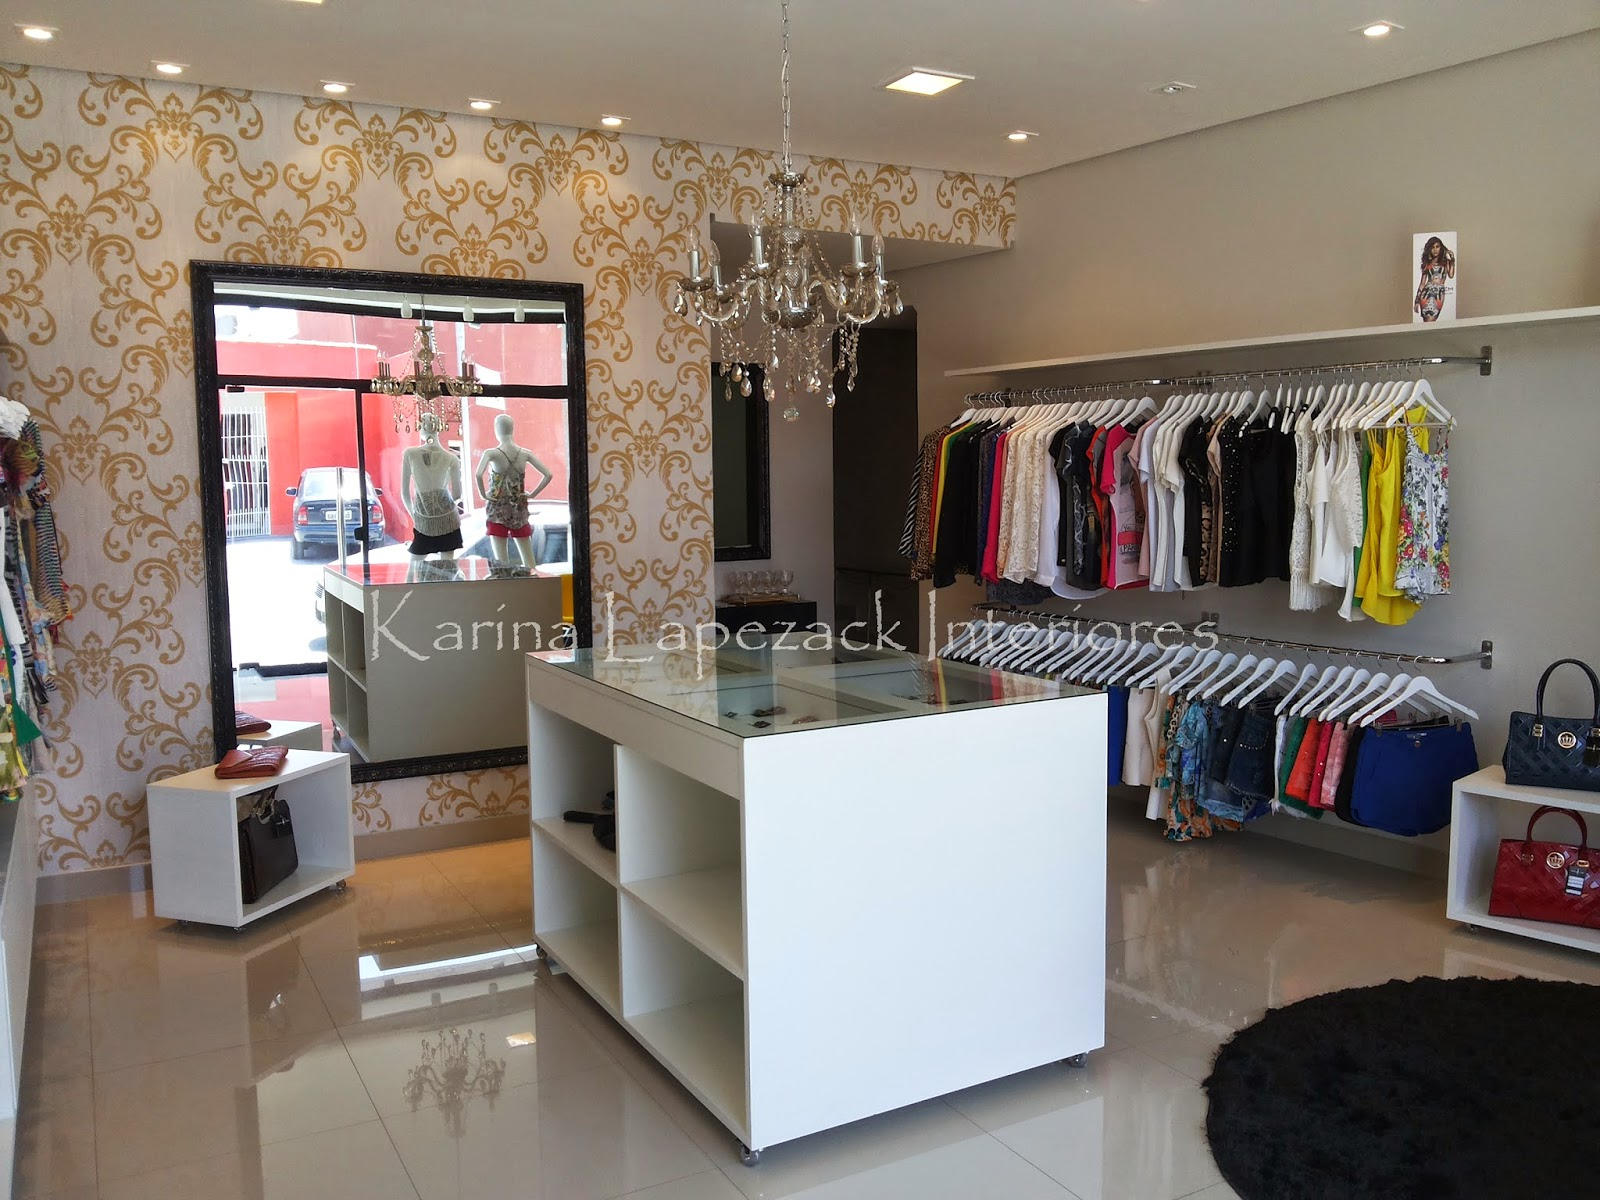 decoracao de interiores de lojas de roupas:Decoração De Interiores – Lojas De Roupas Femininas – Loja de Roupas